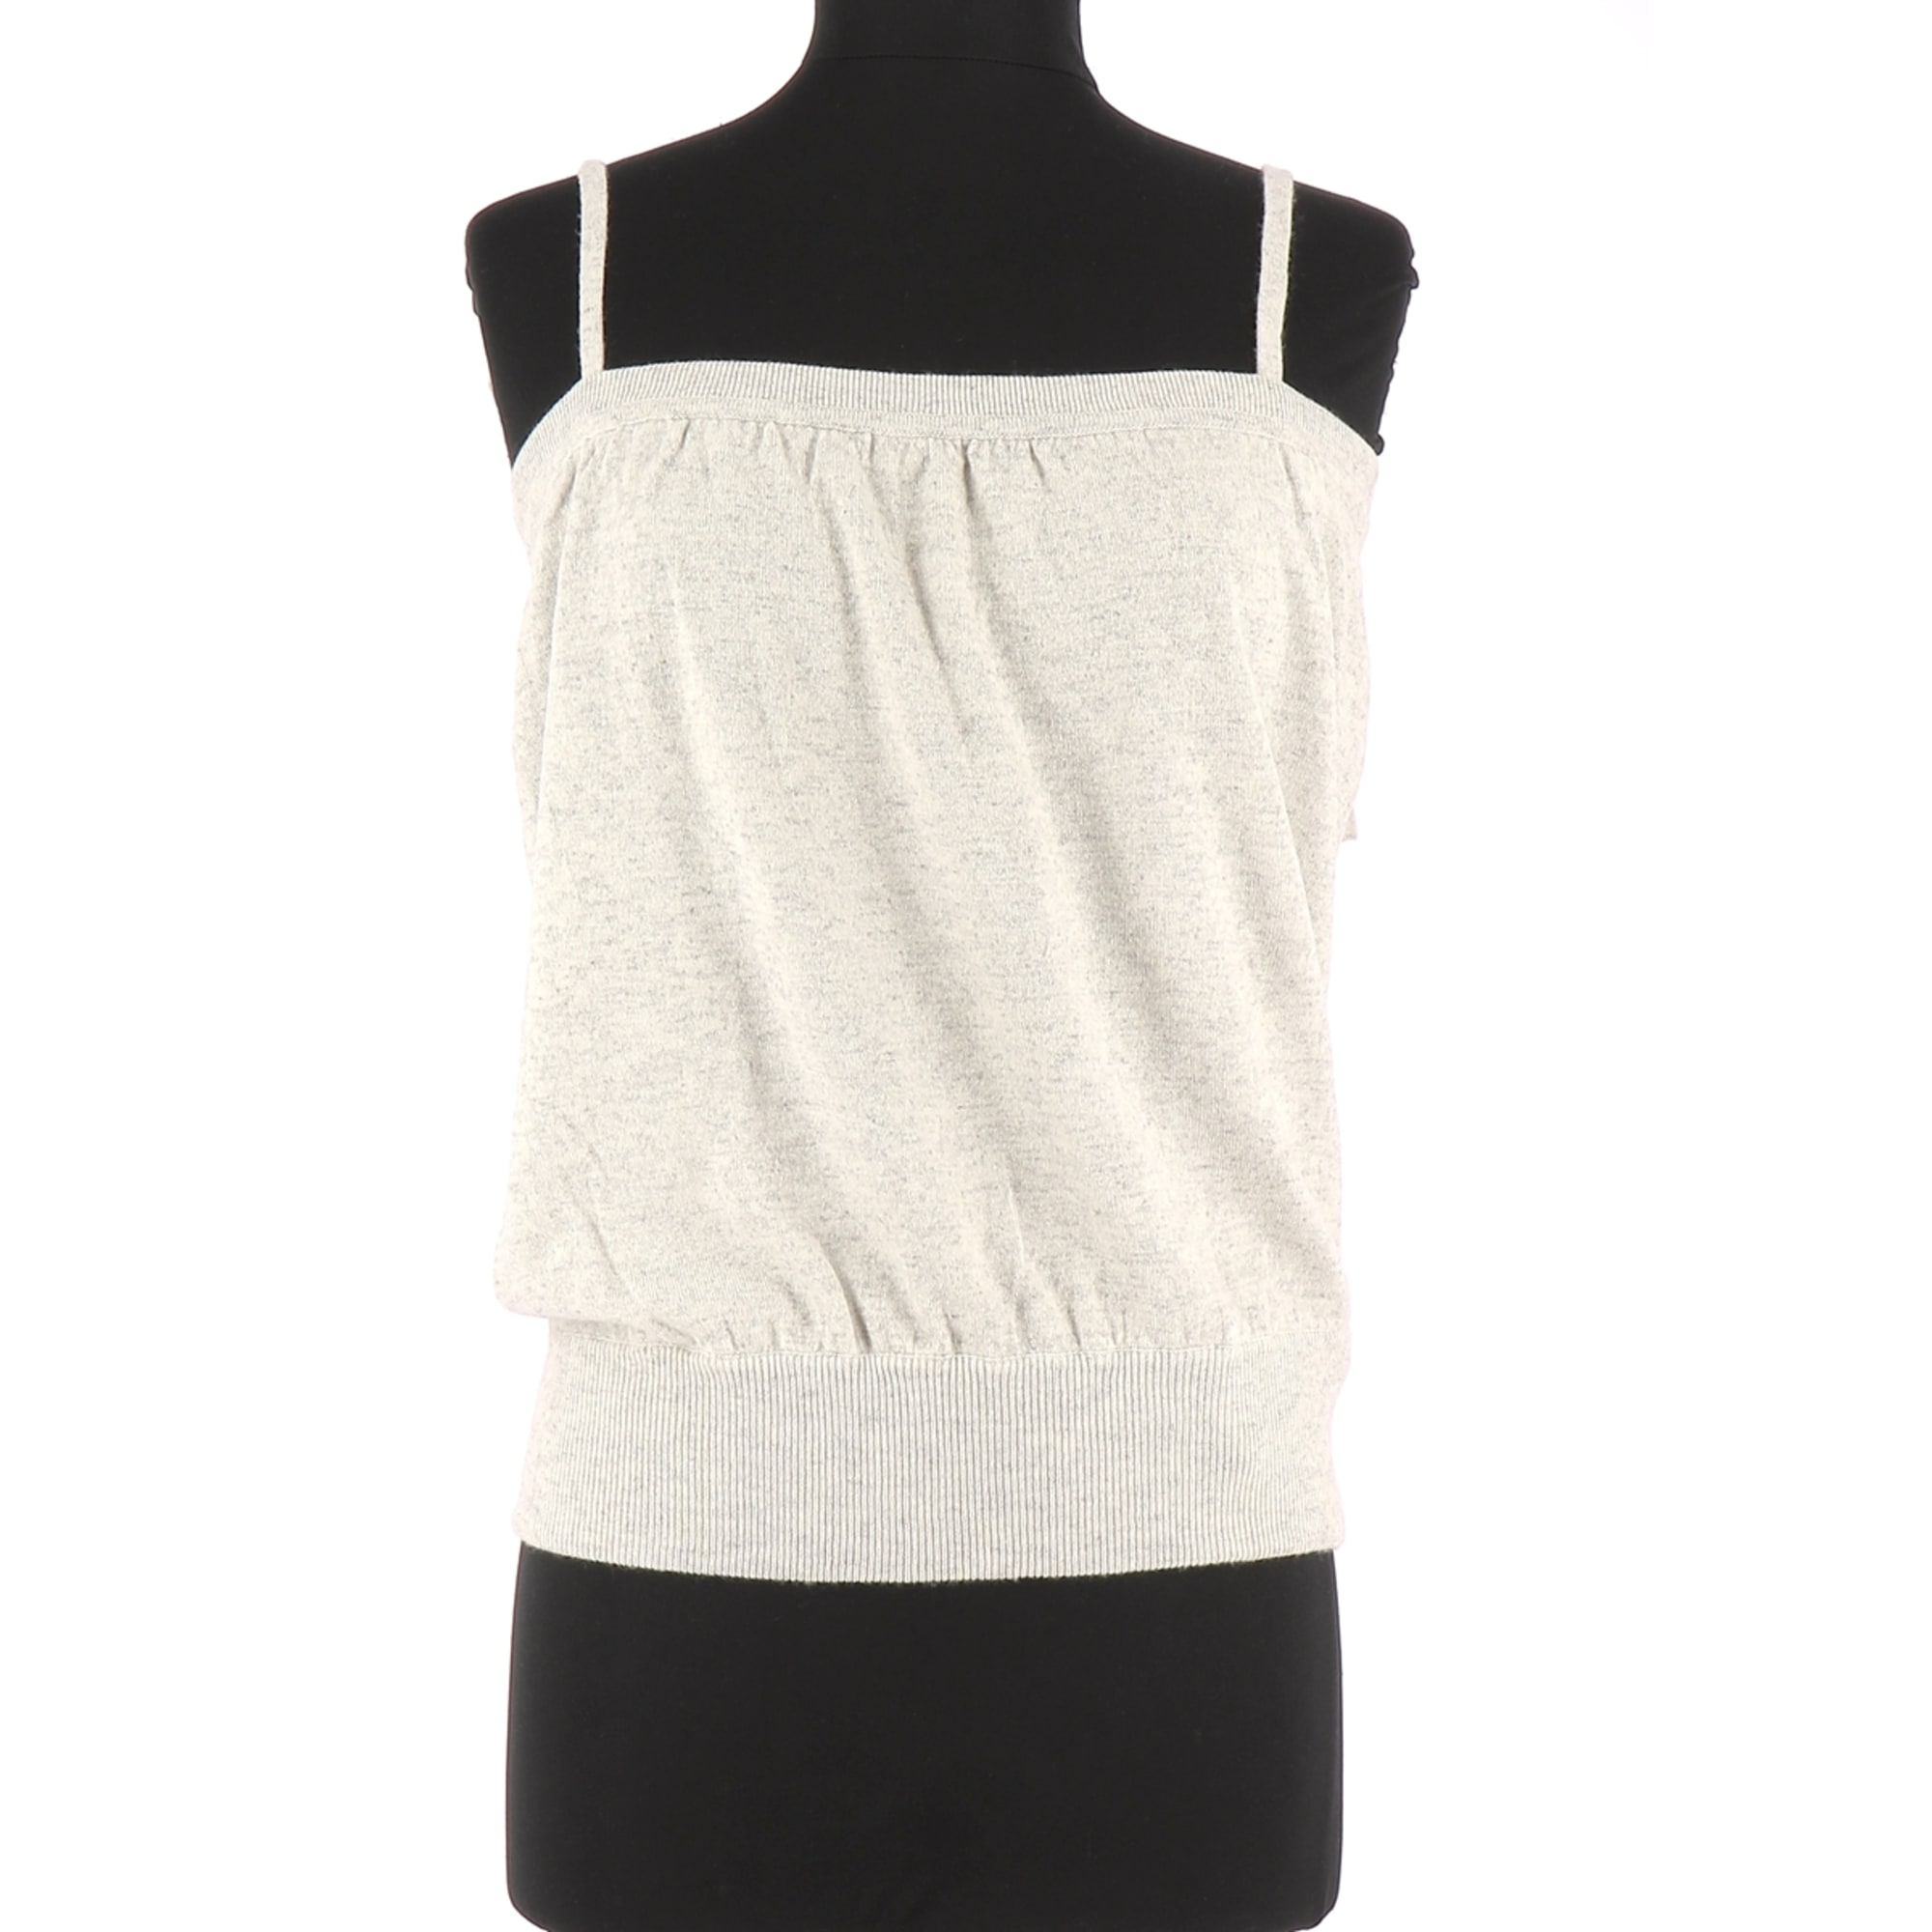 Top, tee-shirt ERIC BOMPARD Gris, anthracite